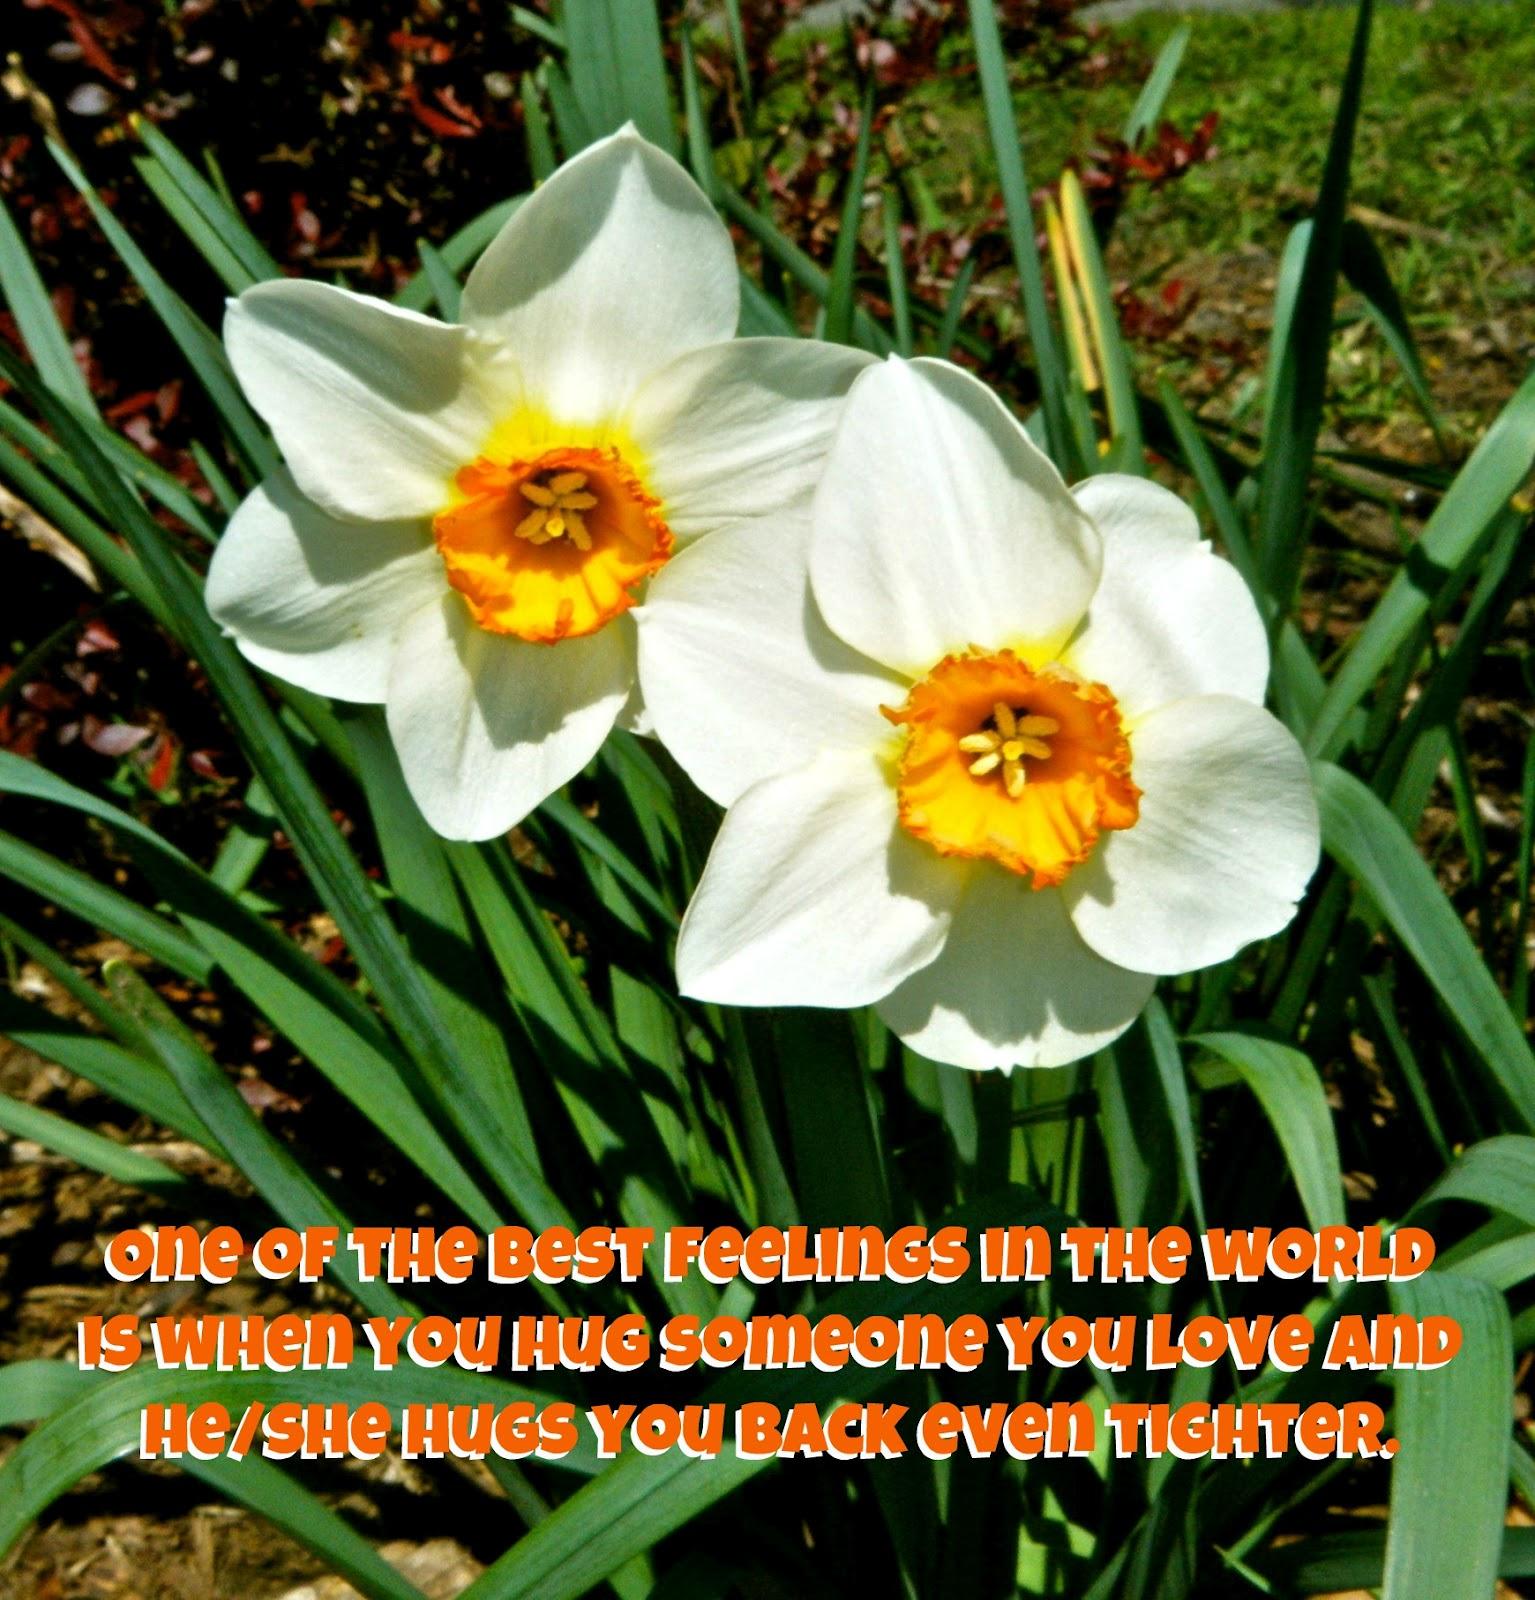 love faithfulness meet together